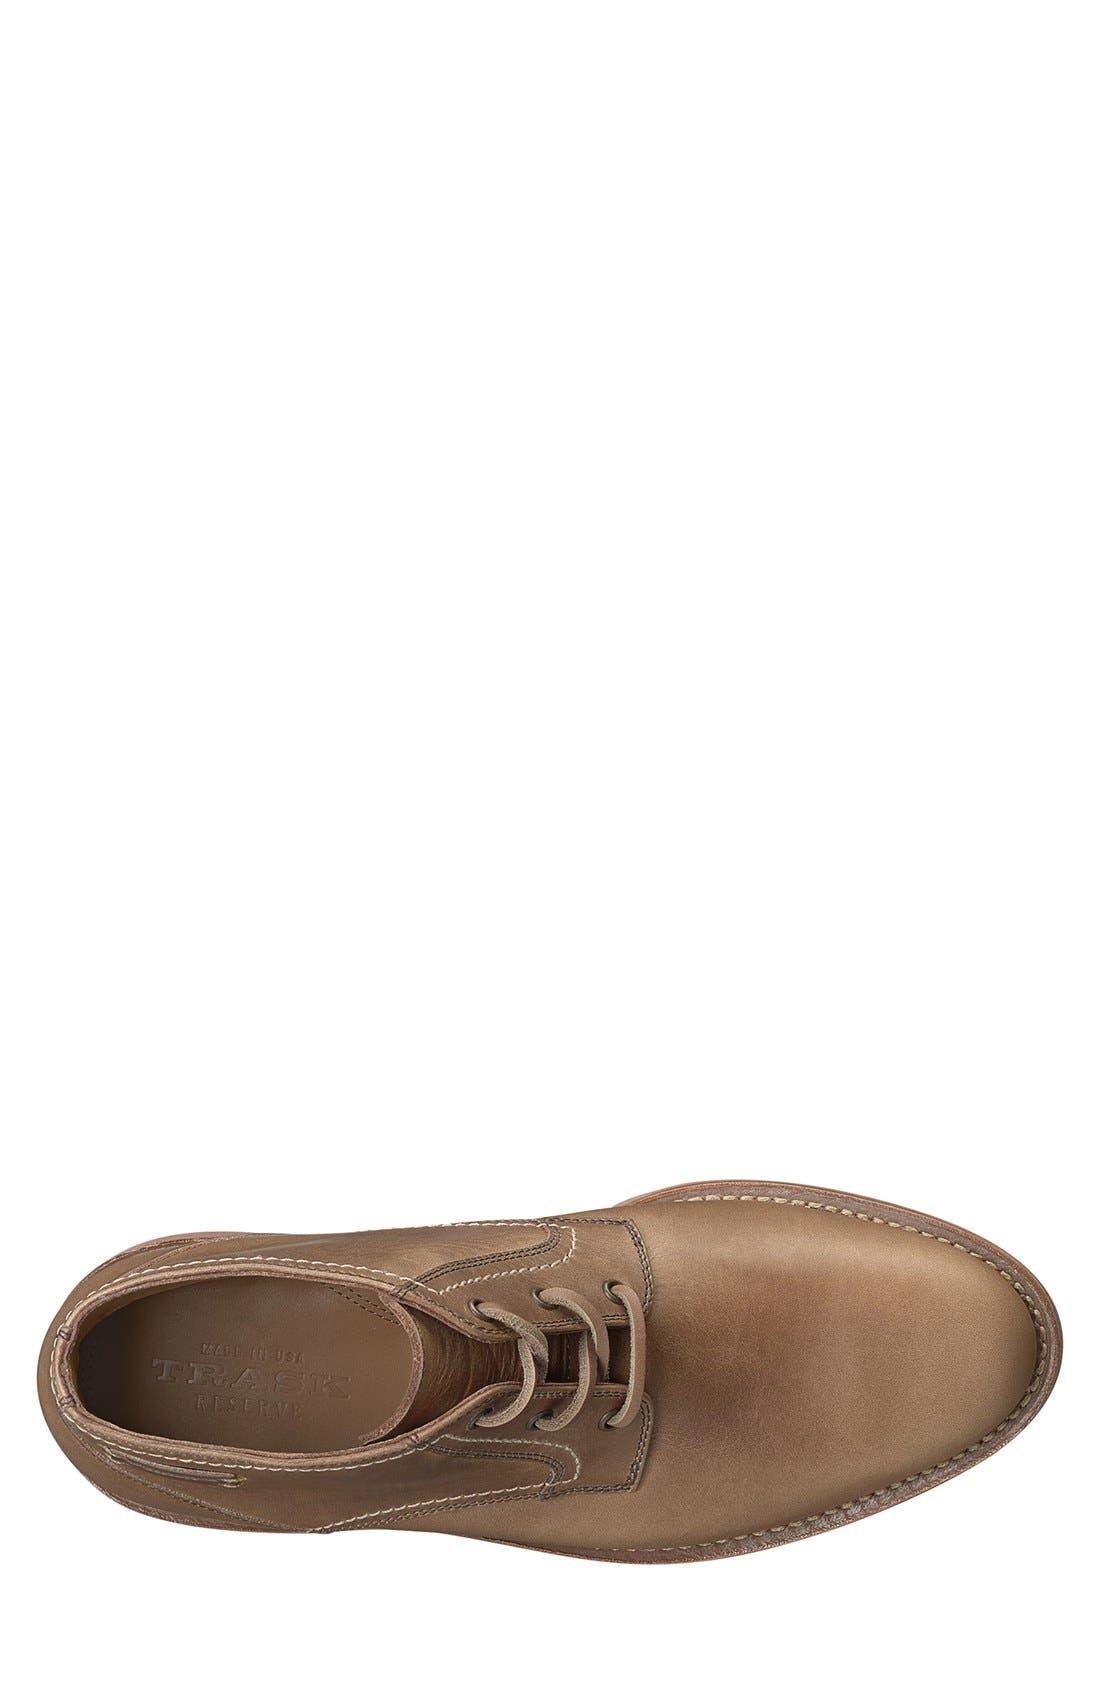 'Bighorn' Plain Toe Boot,                             Alternate thumbnail 12, color,